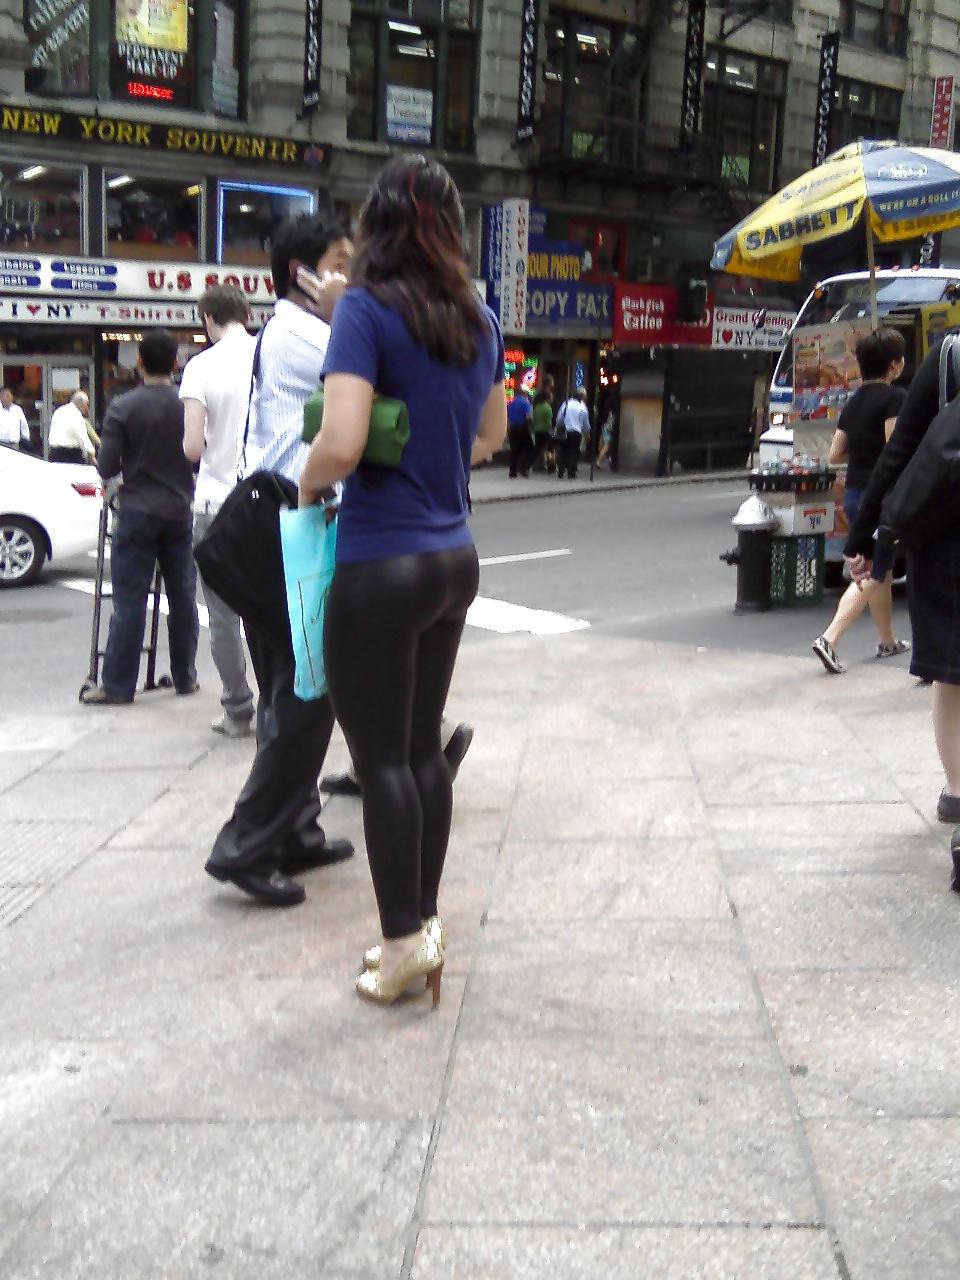 Really tight yoga pants